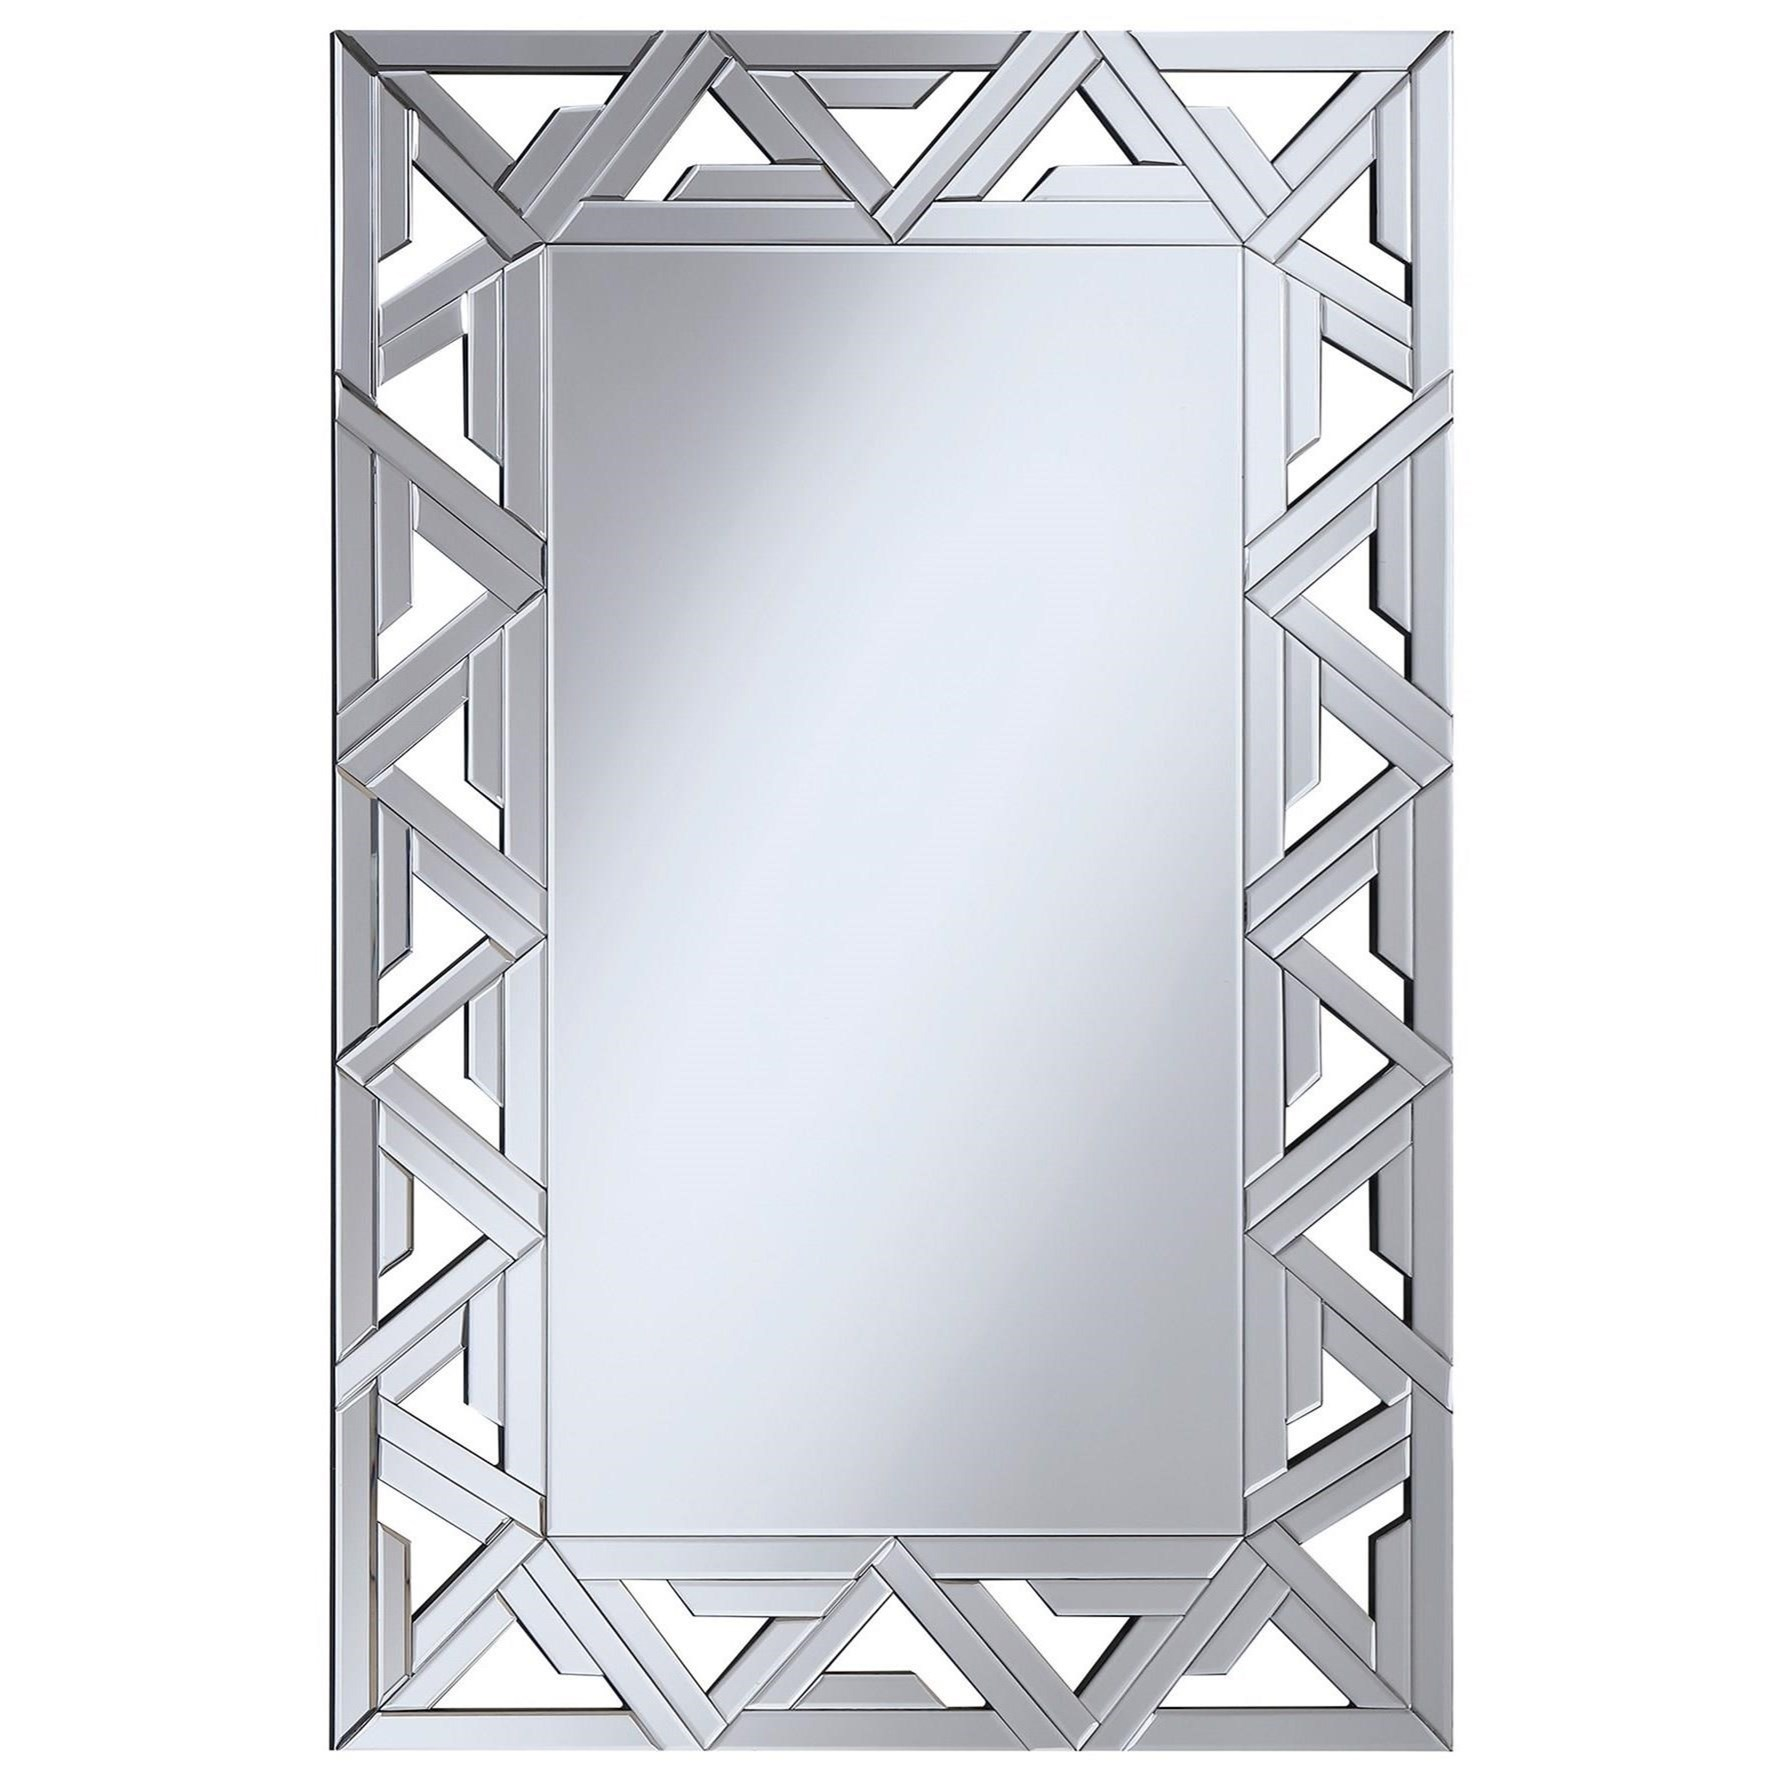 Accent Mirrors Wall Mirror by Coaster at Carolina Direct